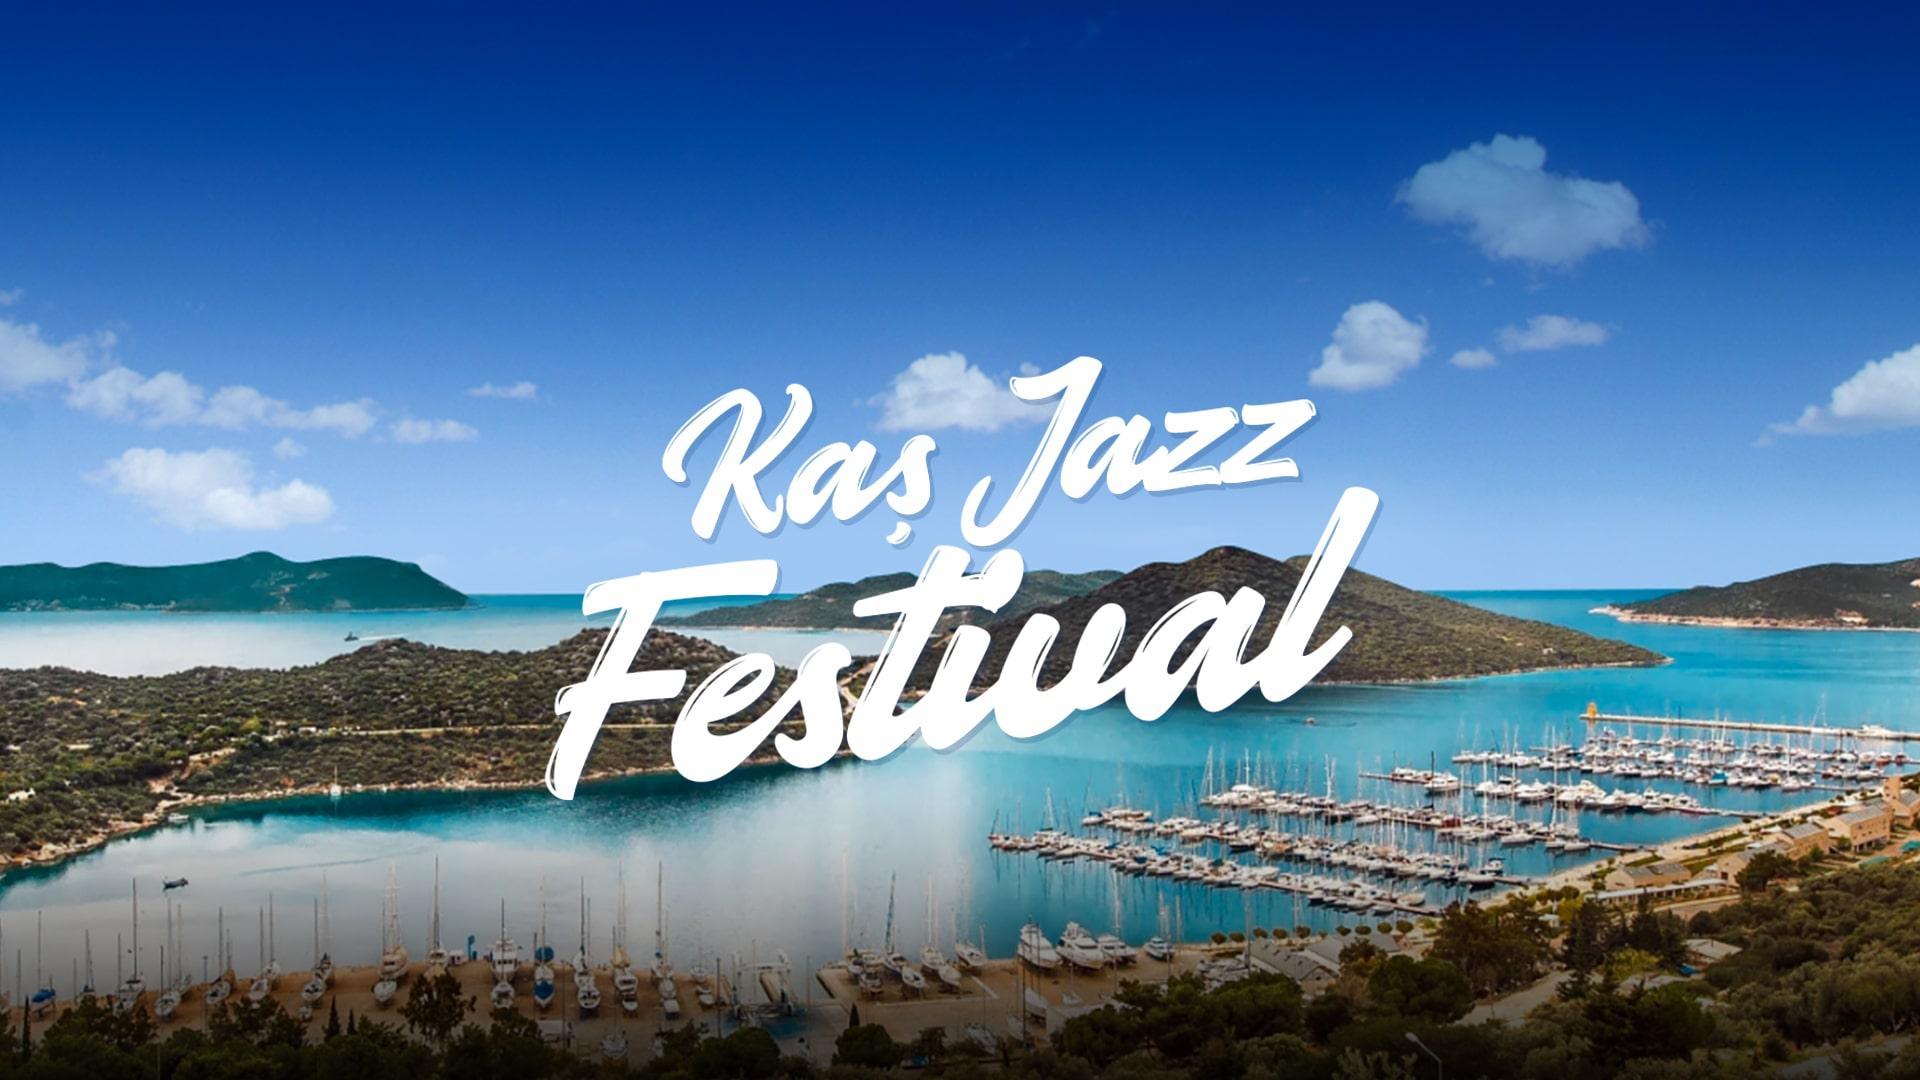 Kaş Jazz Festival